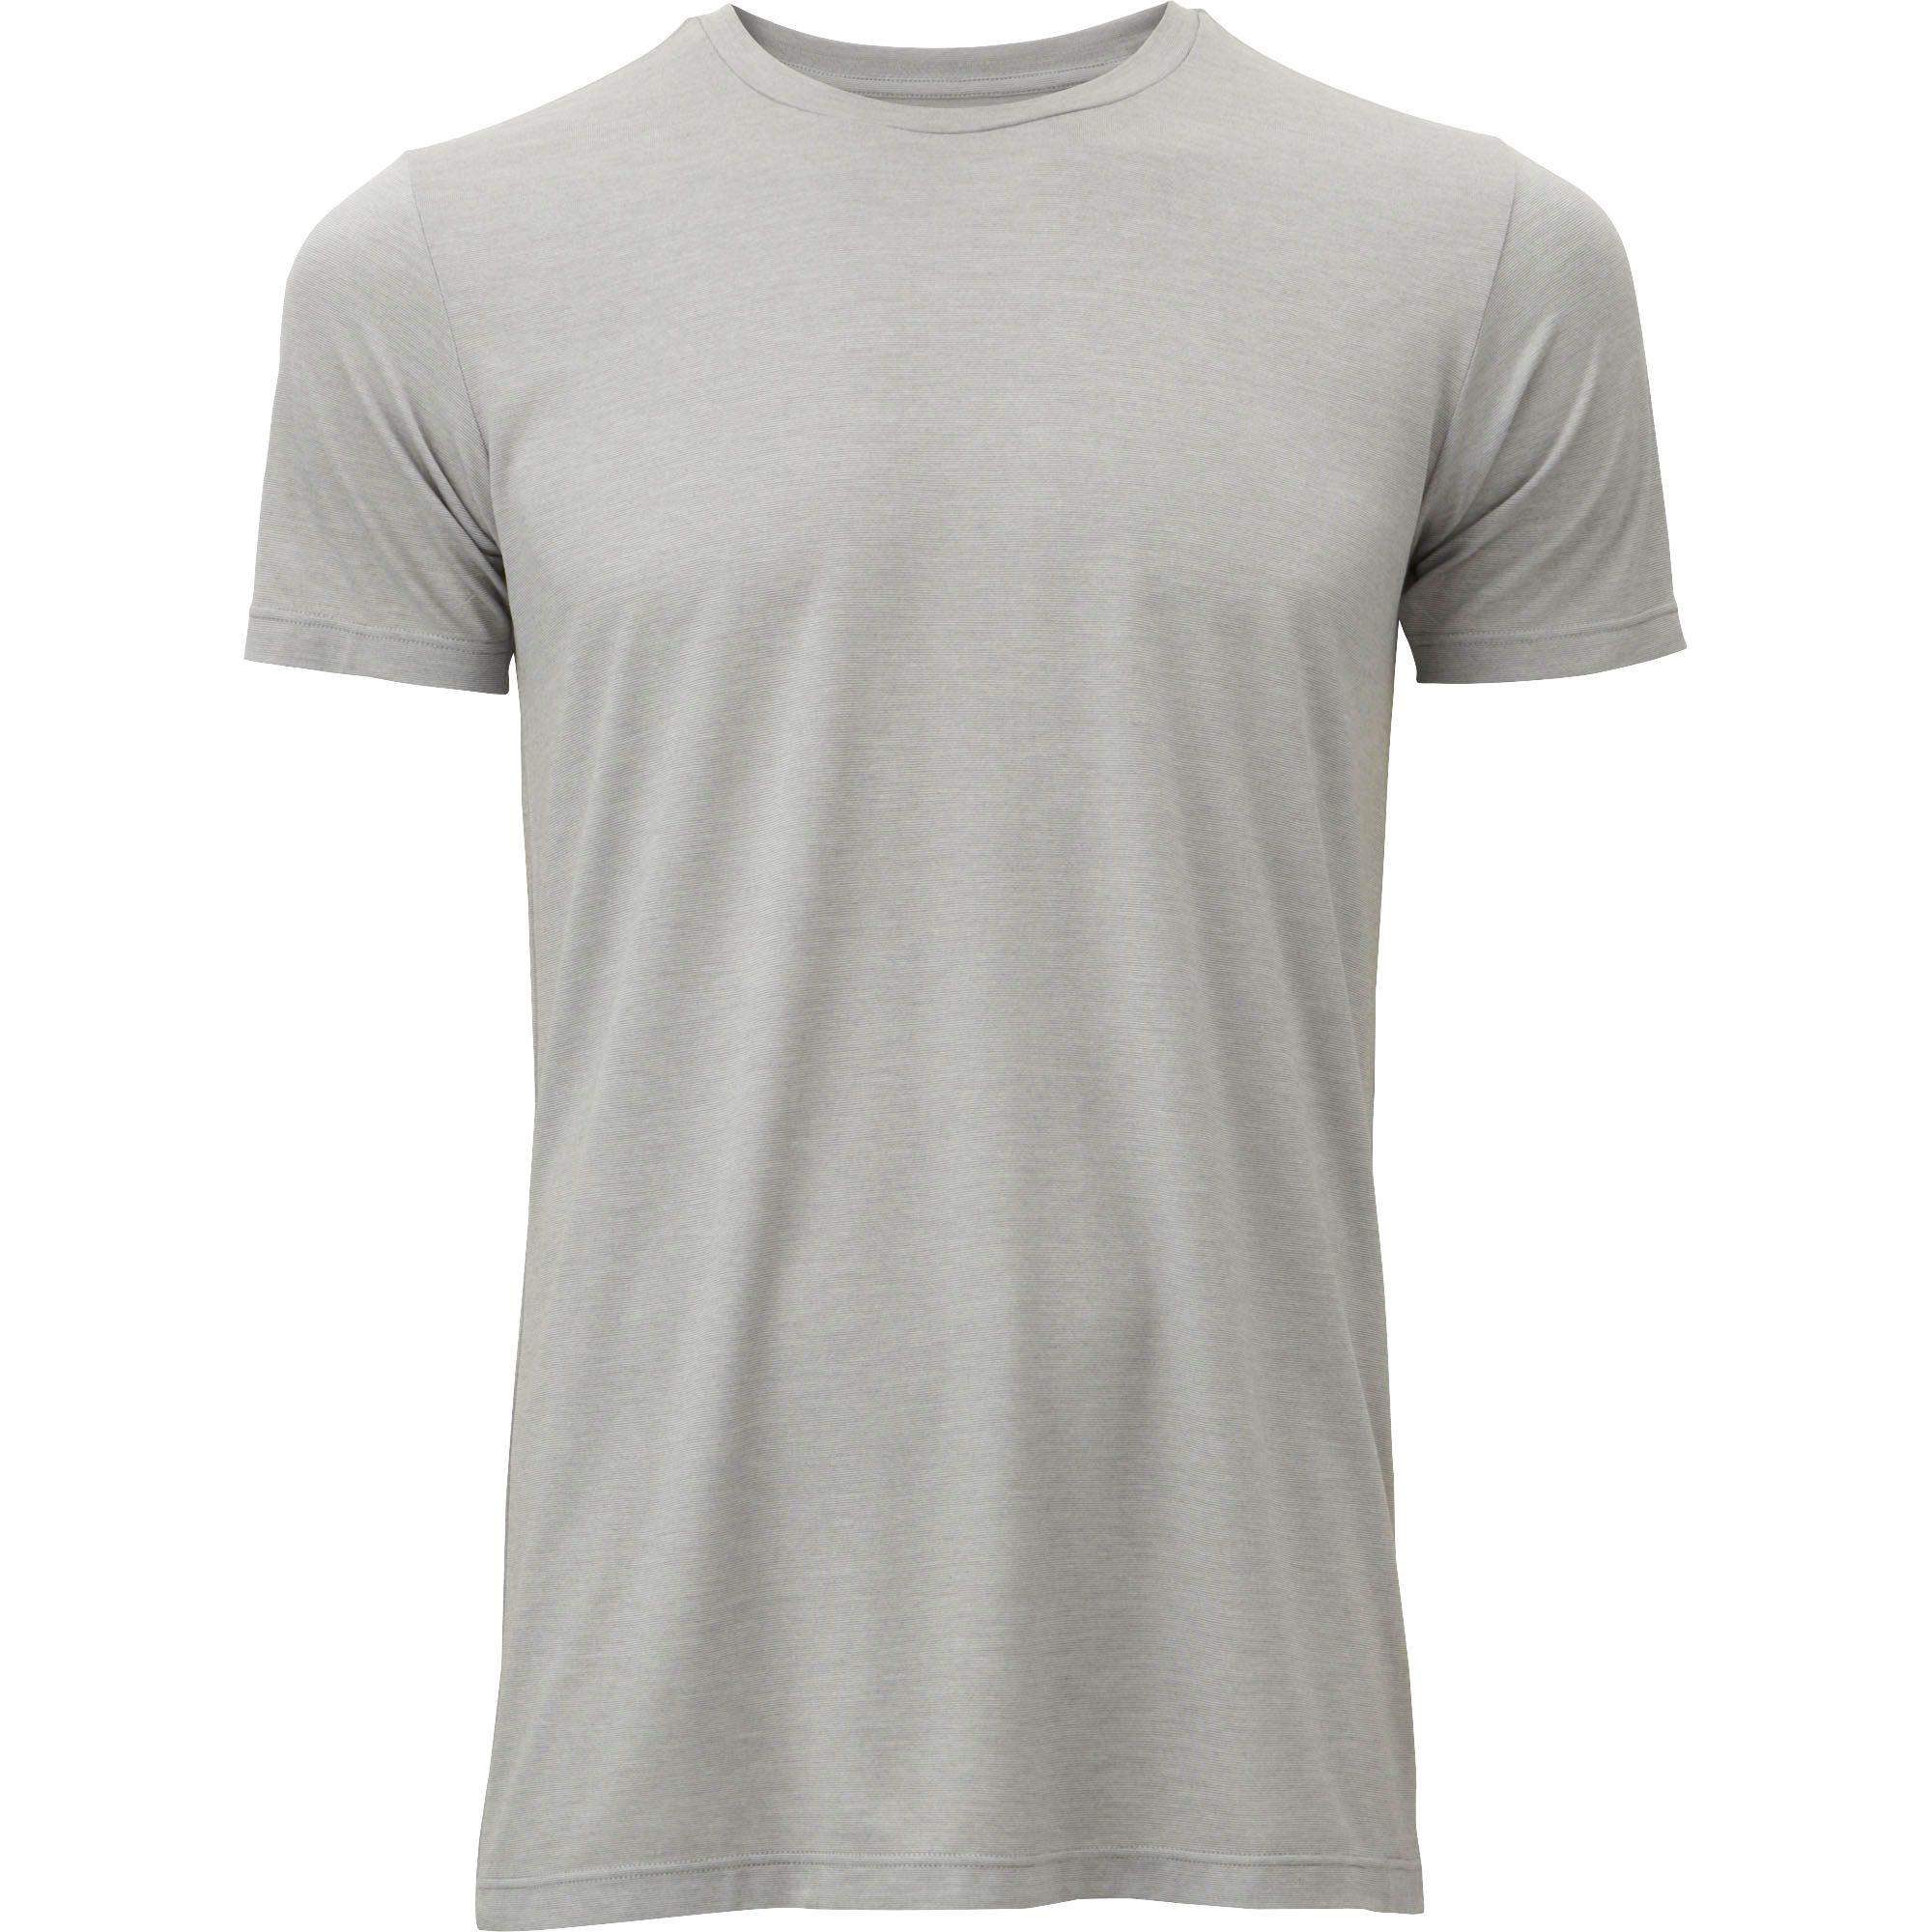 Uniqlo men heattech crewneck t shirt short sleeve in for Uniqlo t shirt sizing